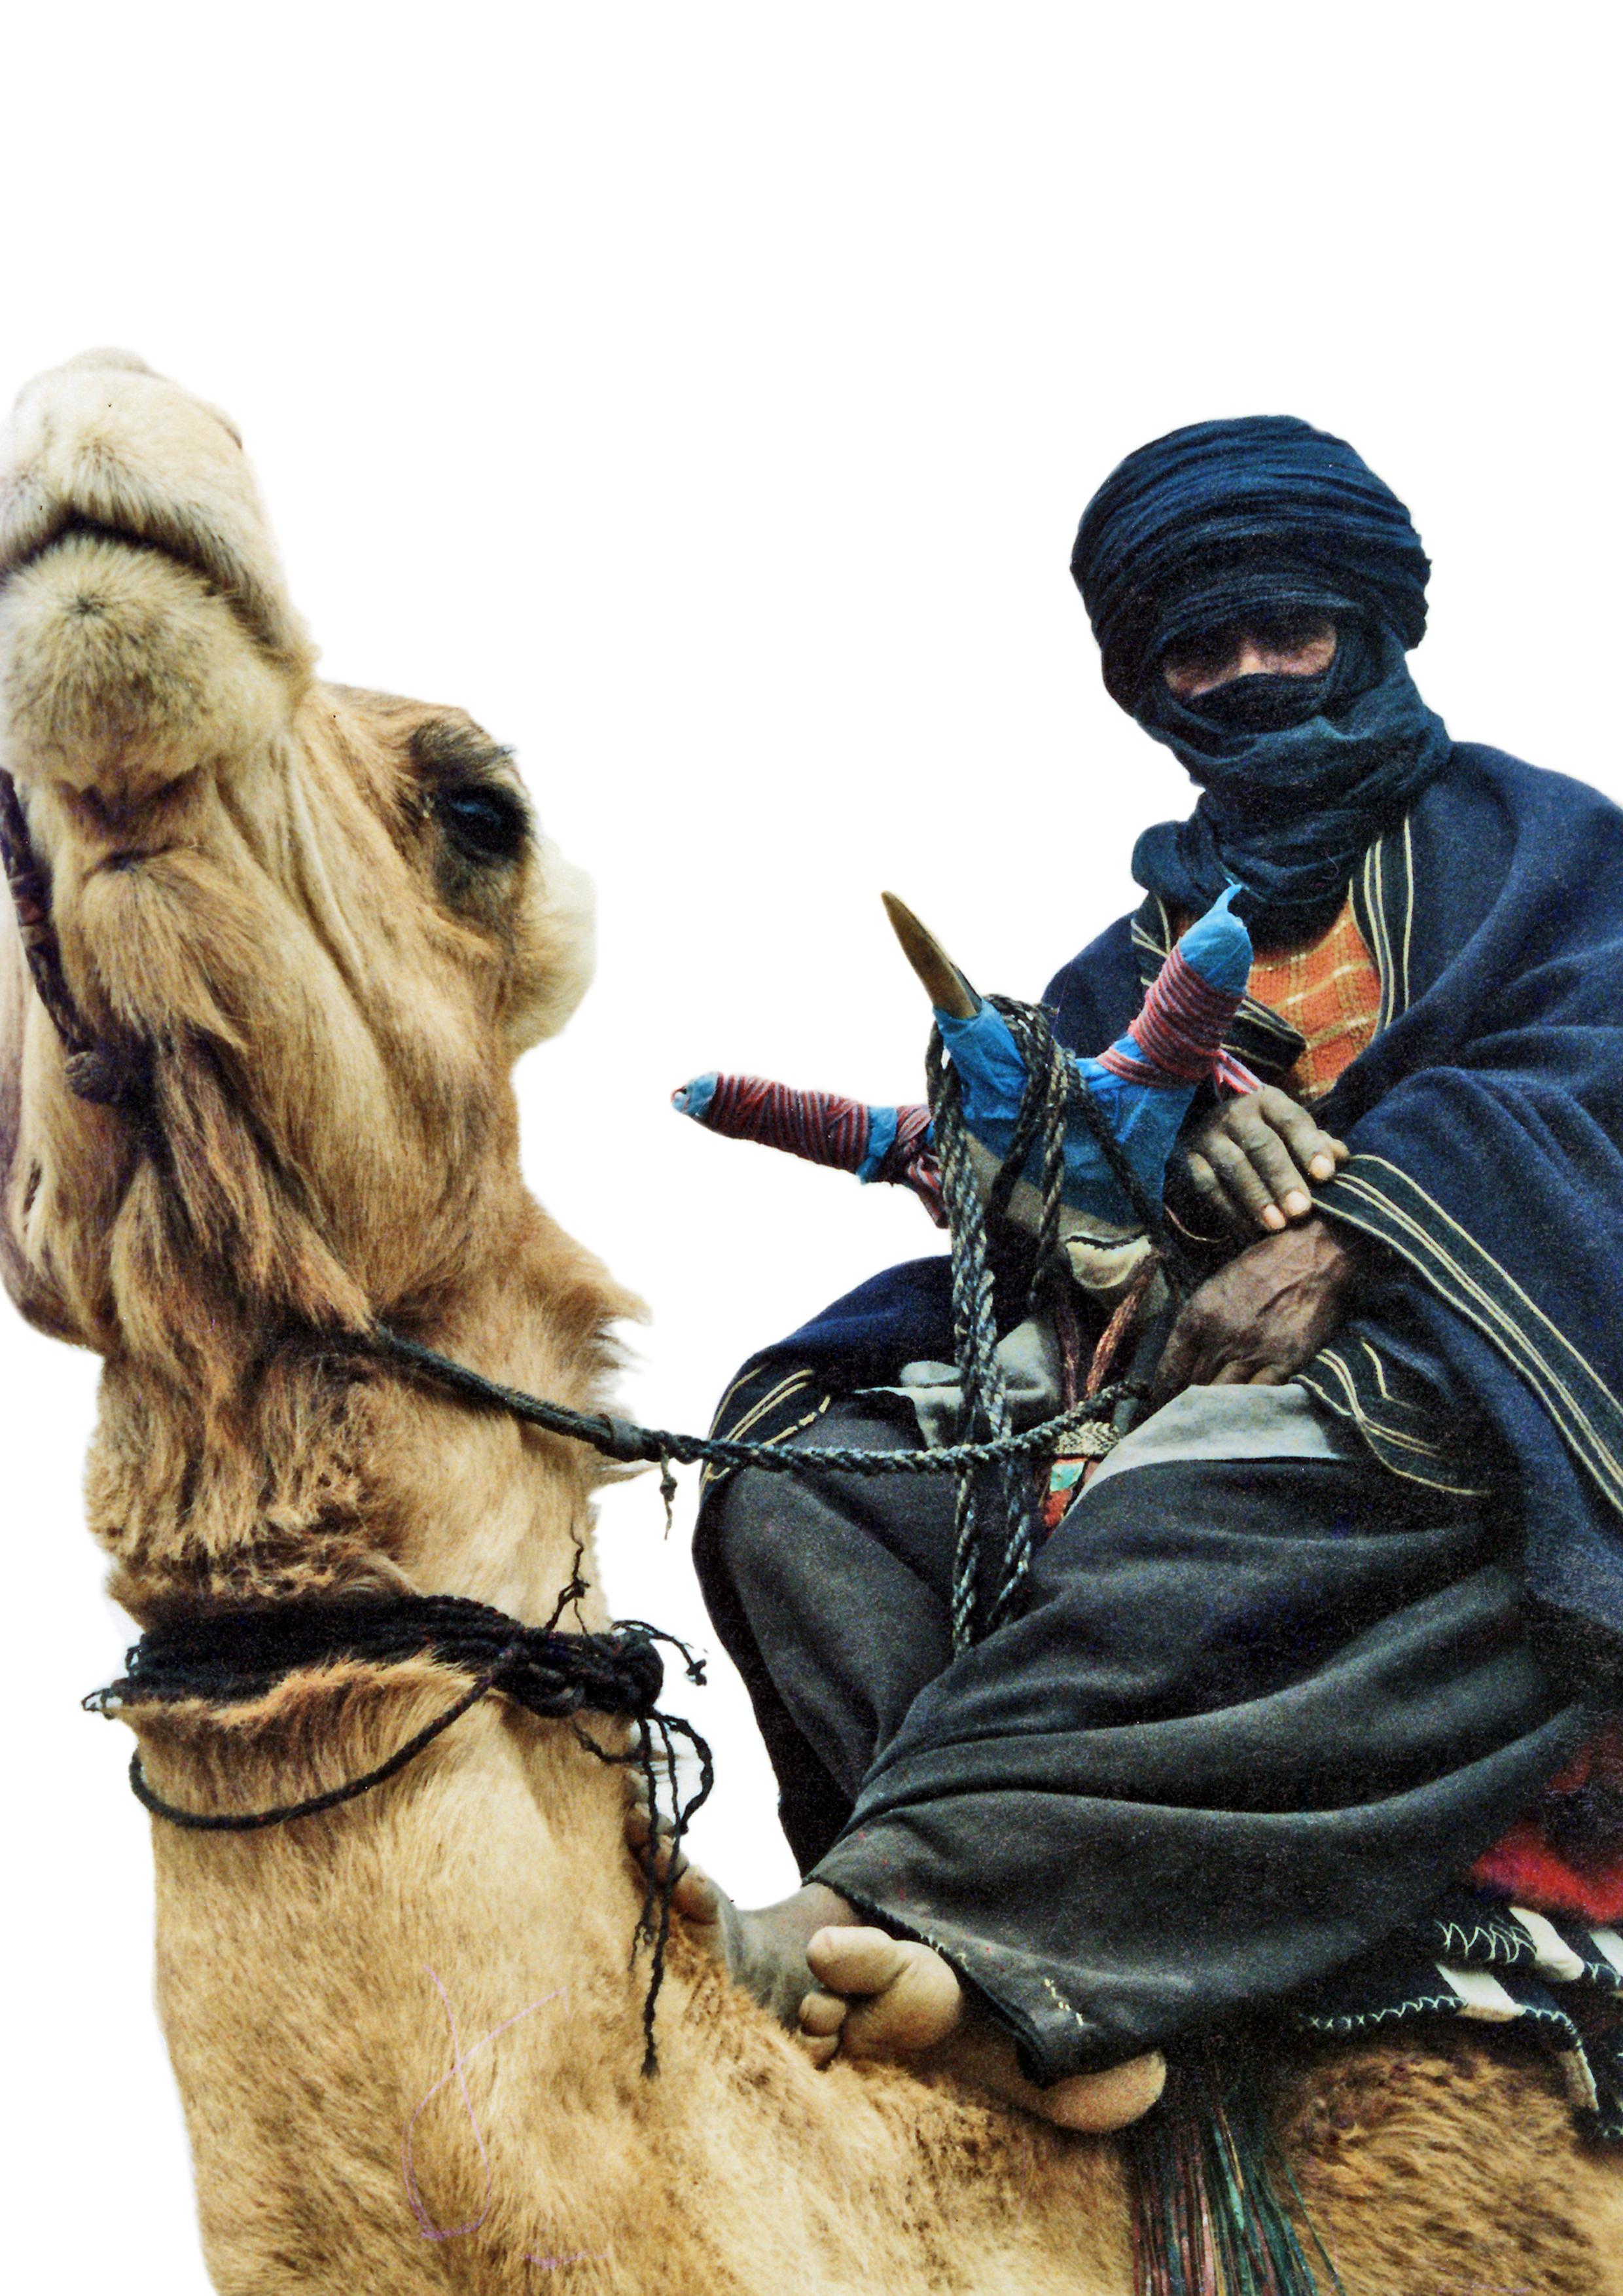 while these Tuaregs take